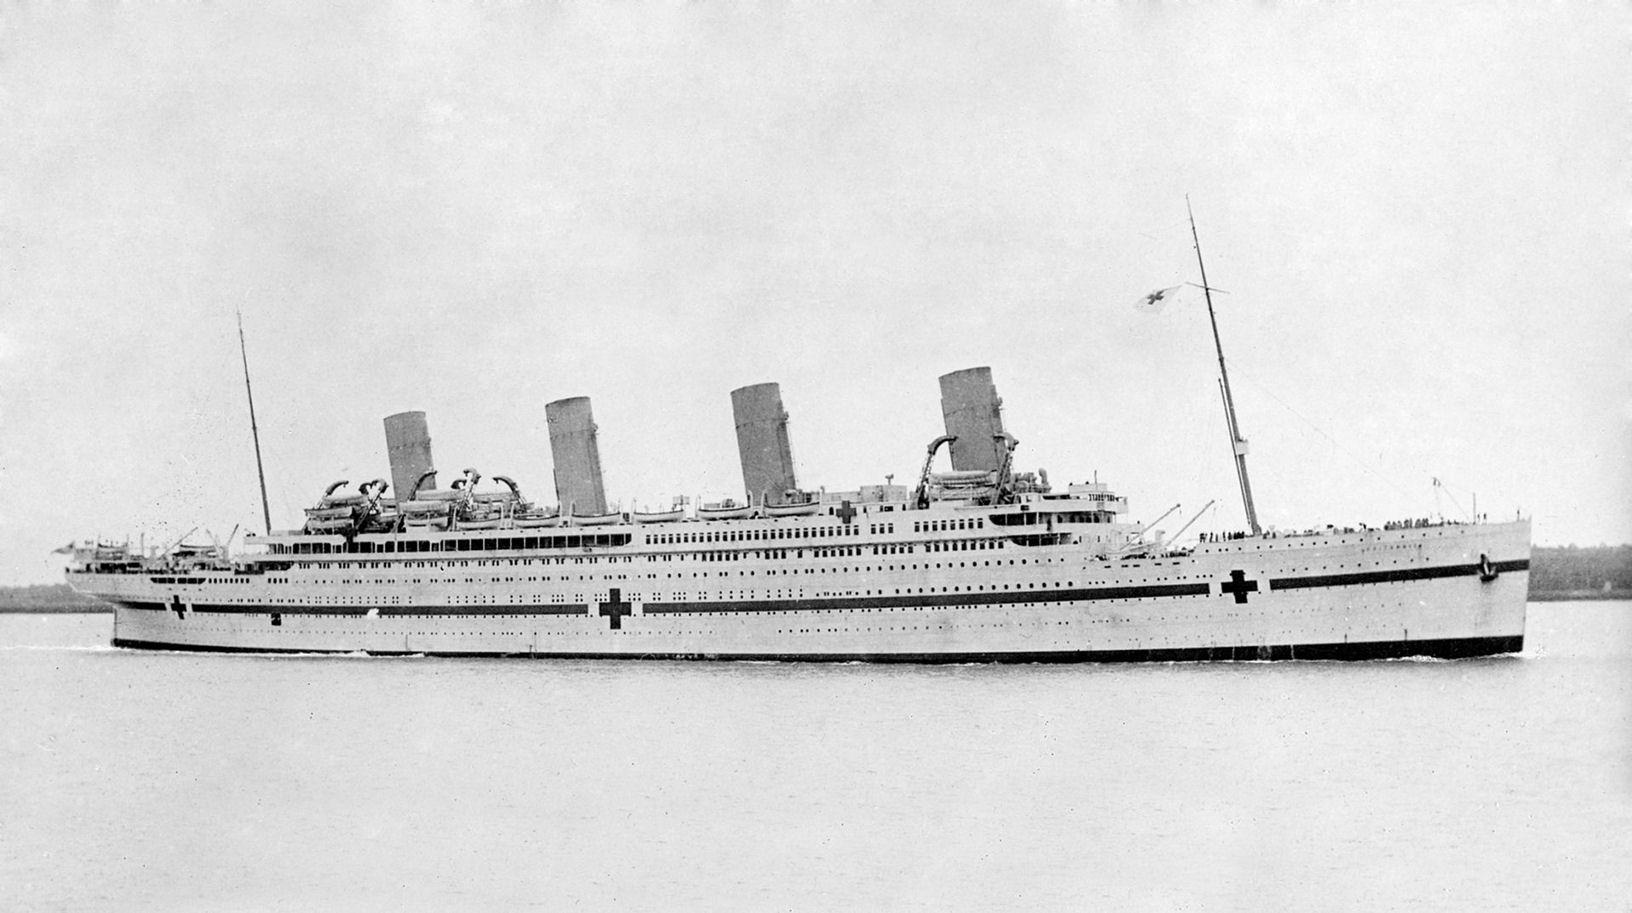 Hospital Ship Britannic. Courtesy of Wikimedia Commons